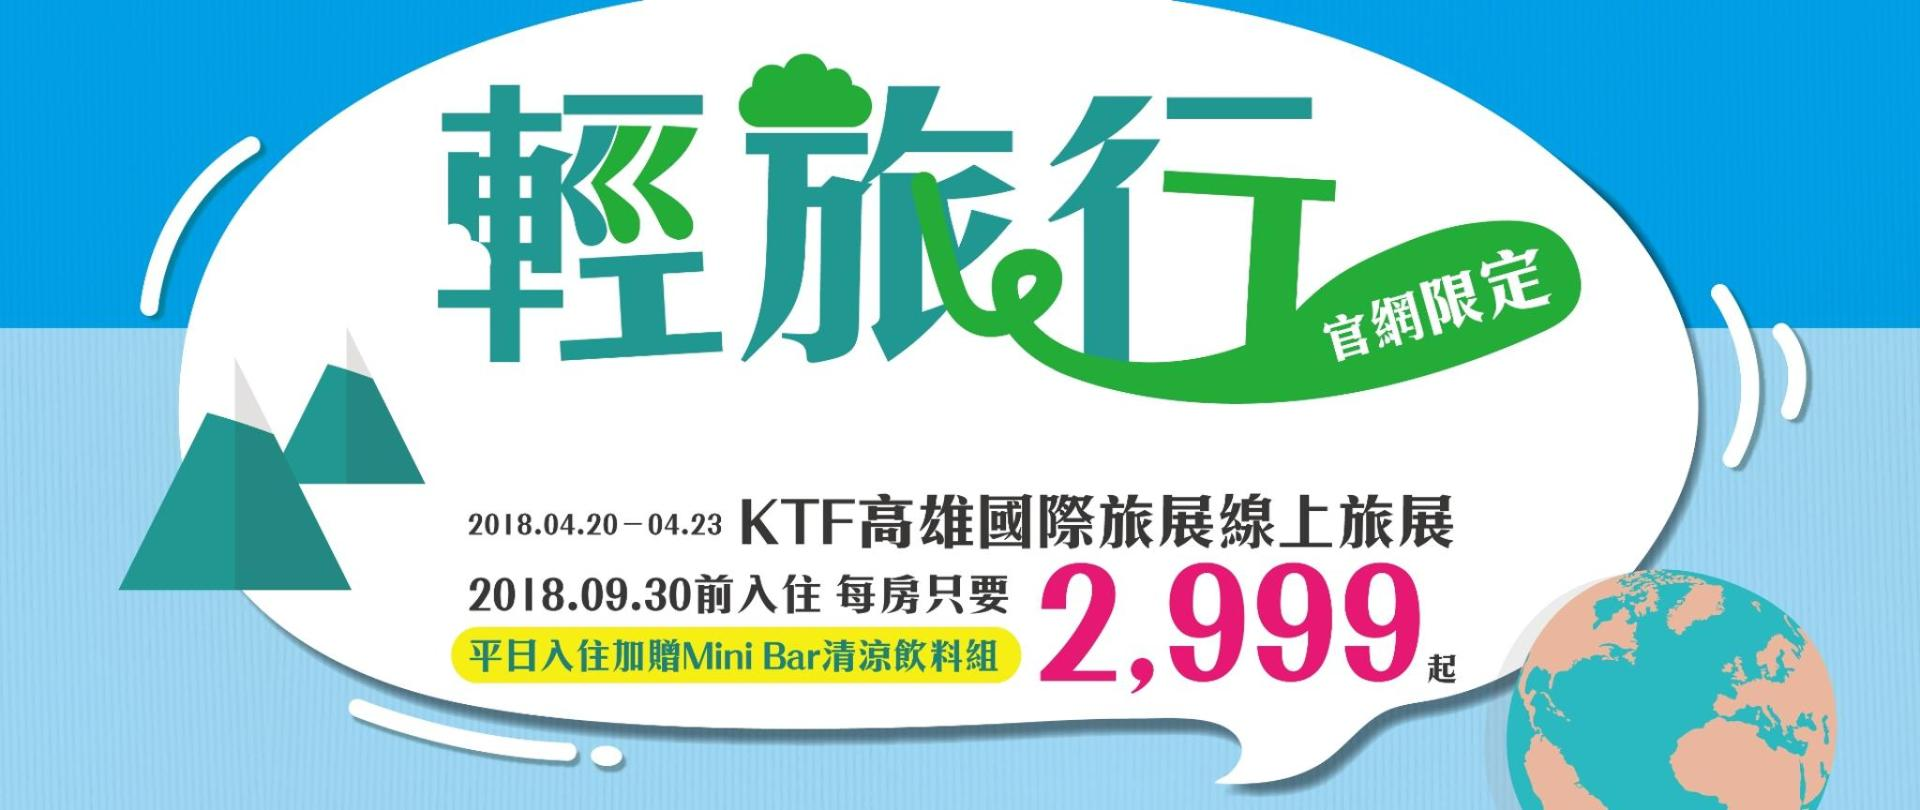 2018Q2線上旅展專案_官網首頁.jpg